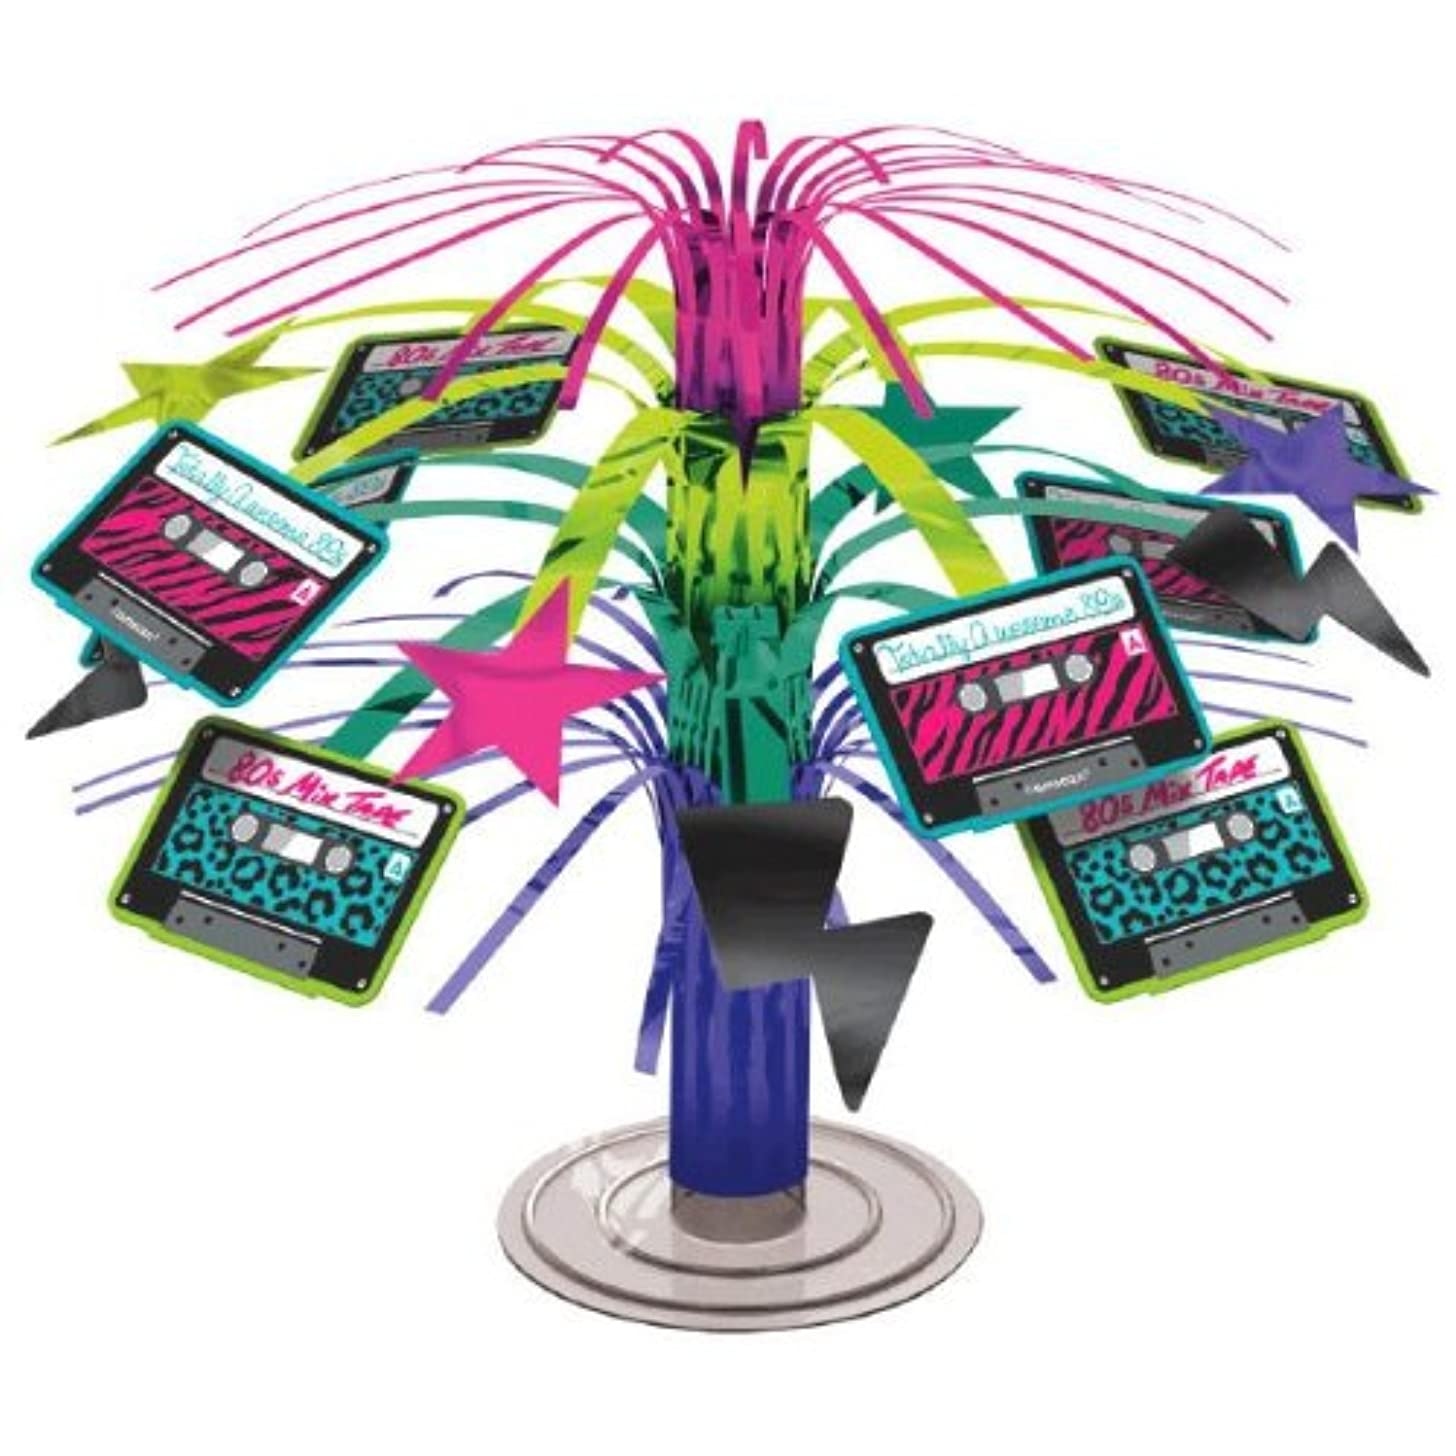 Amscan Totally 80's Party Cassette Mini Cascade Centerpiece Decoration (1 Piece), Multi Color, 7.5 in